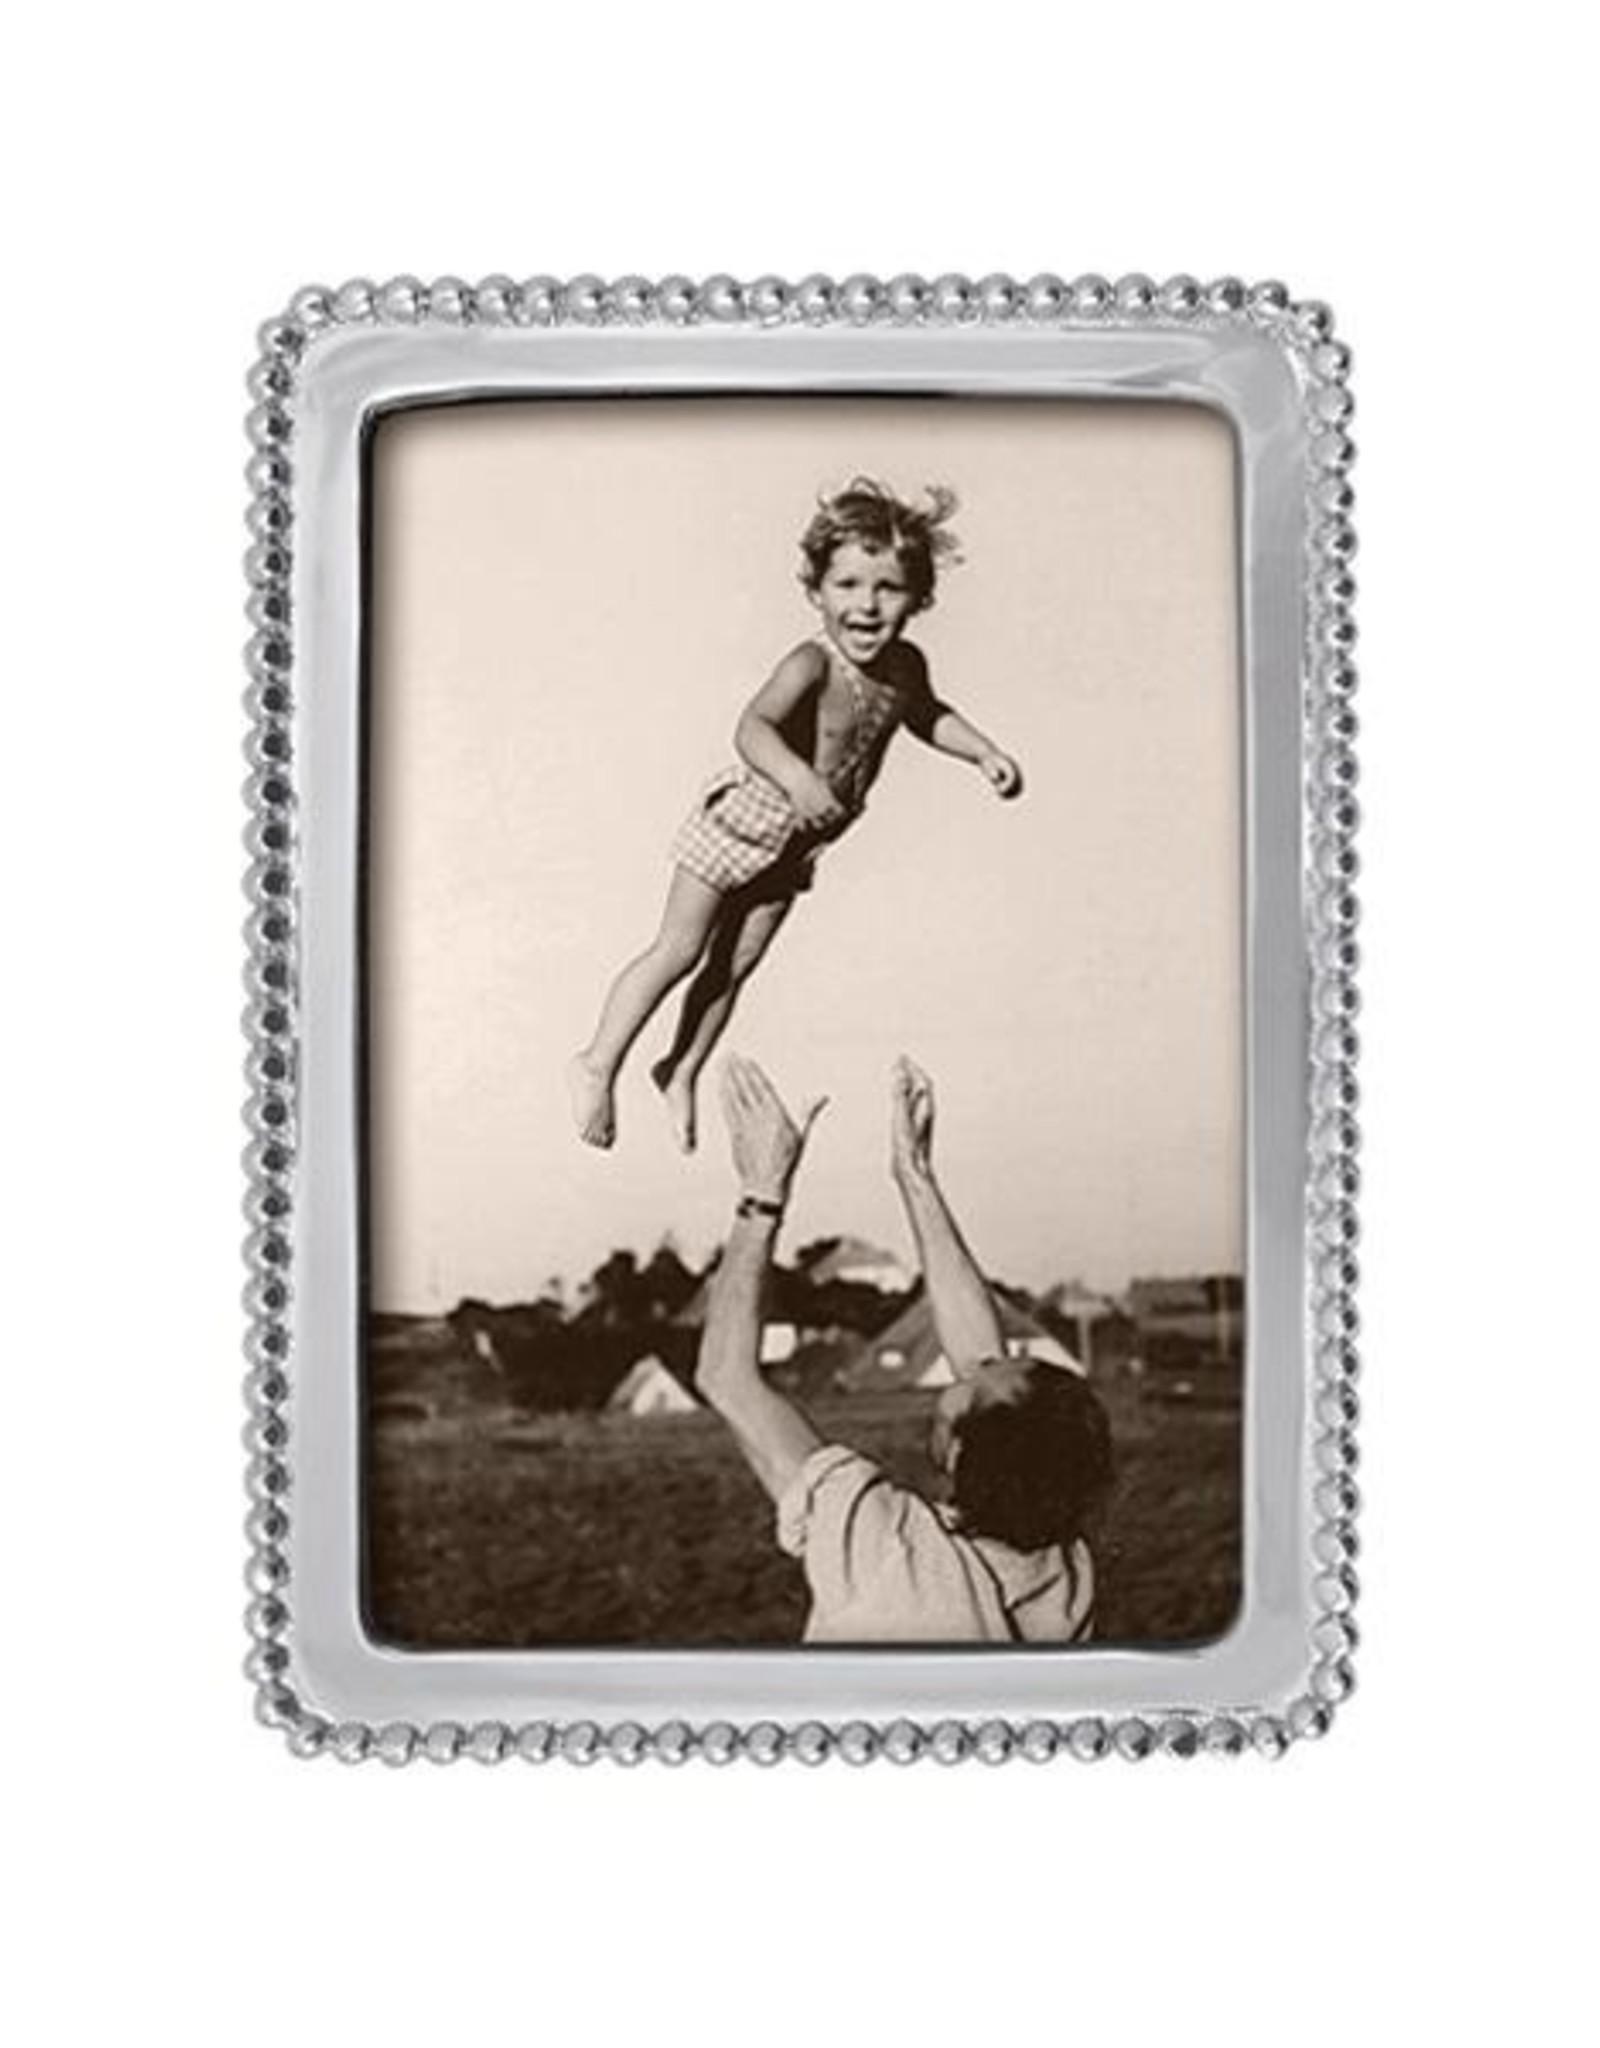 Mariposa Mariposa - Beaded 5 x 7 Frame